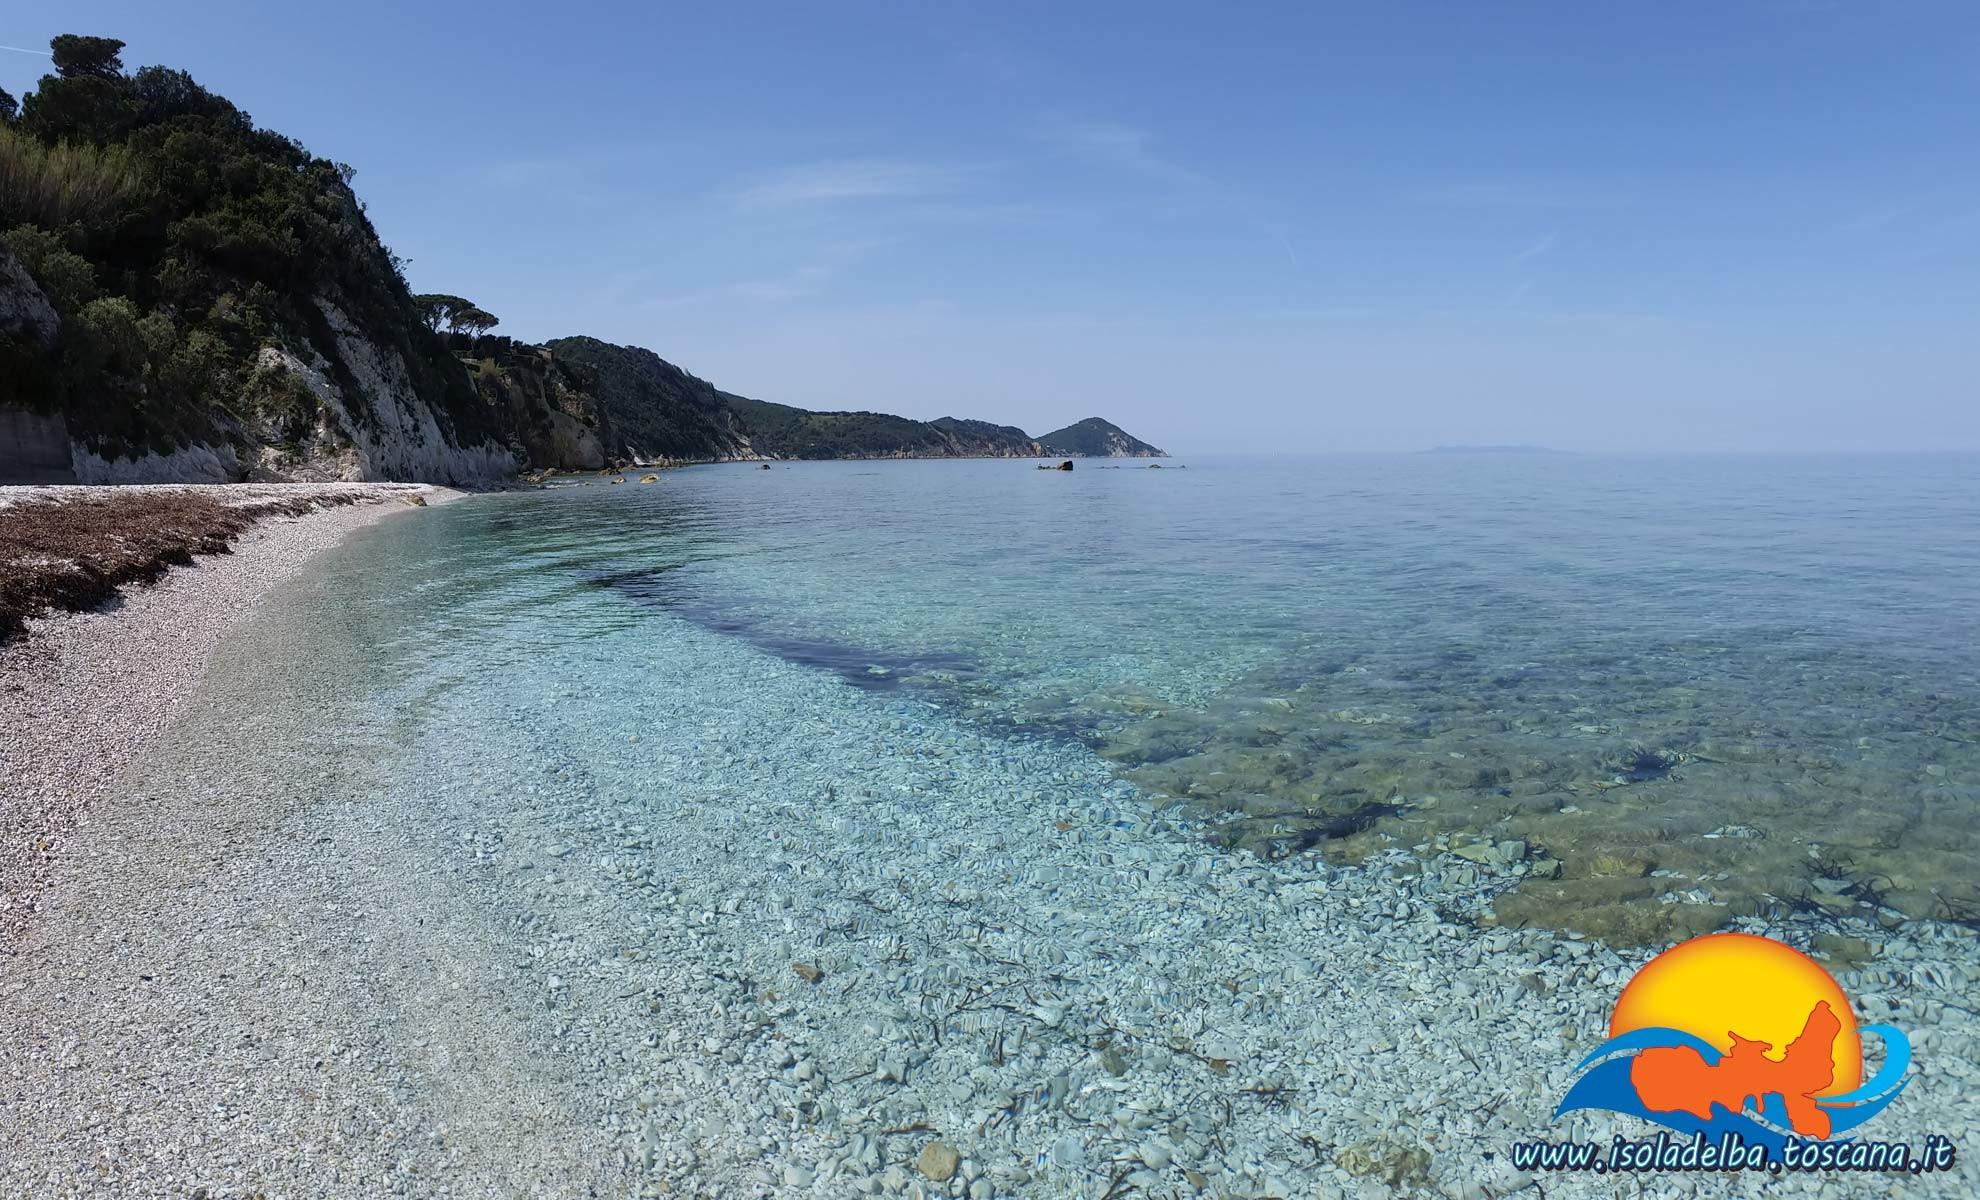 Sfondi panoramici 57 immagini for Desktop gratis mare